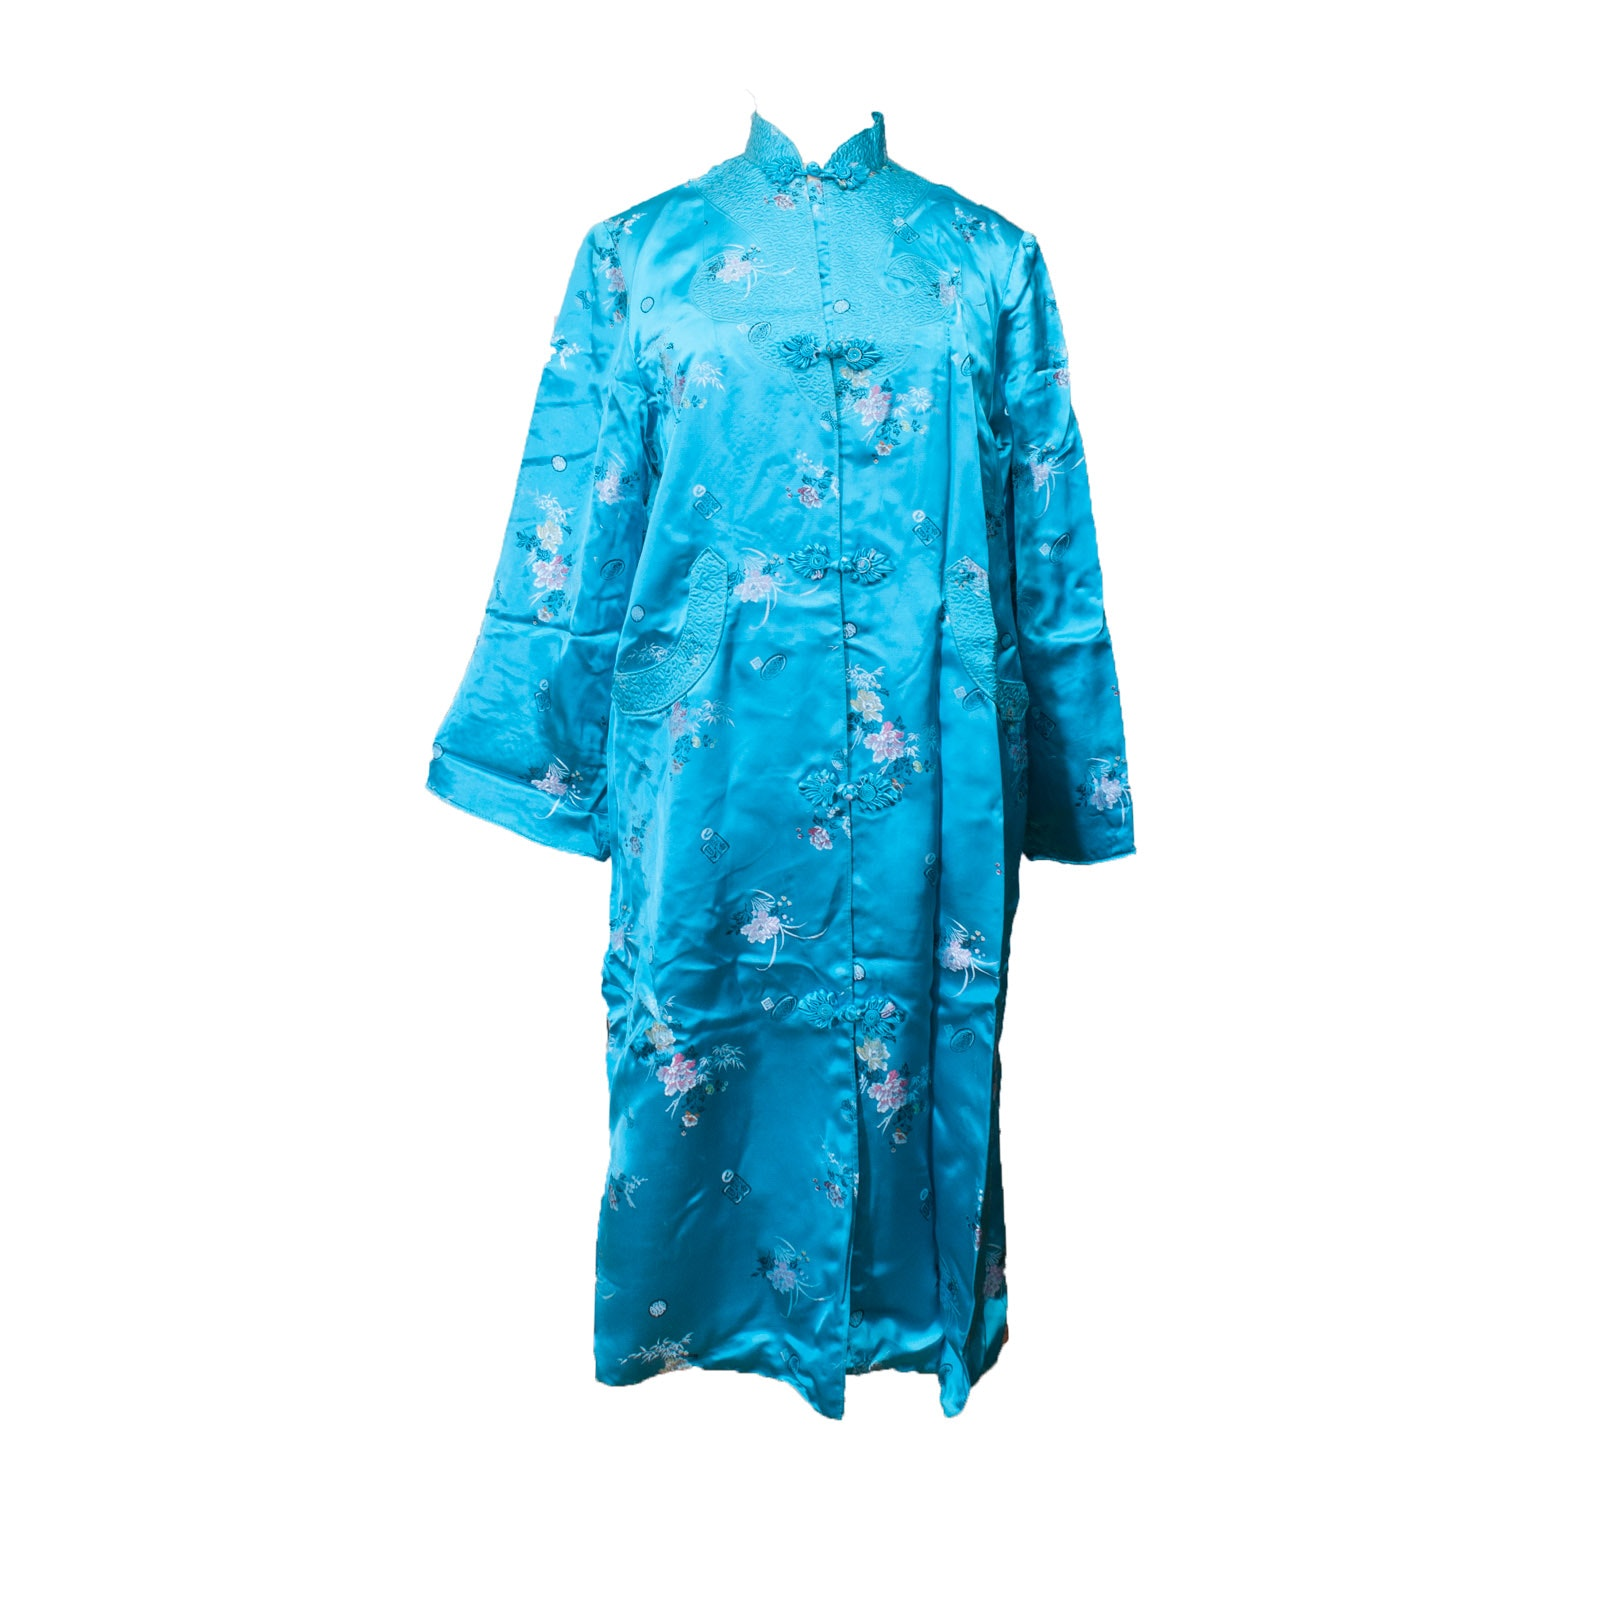 Vintage Chinese Blue Brocade Satin Robe